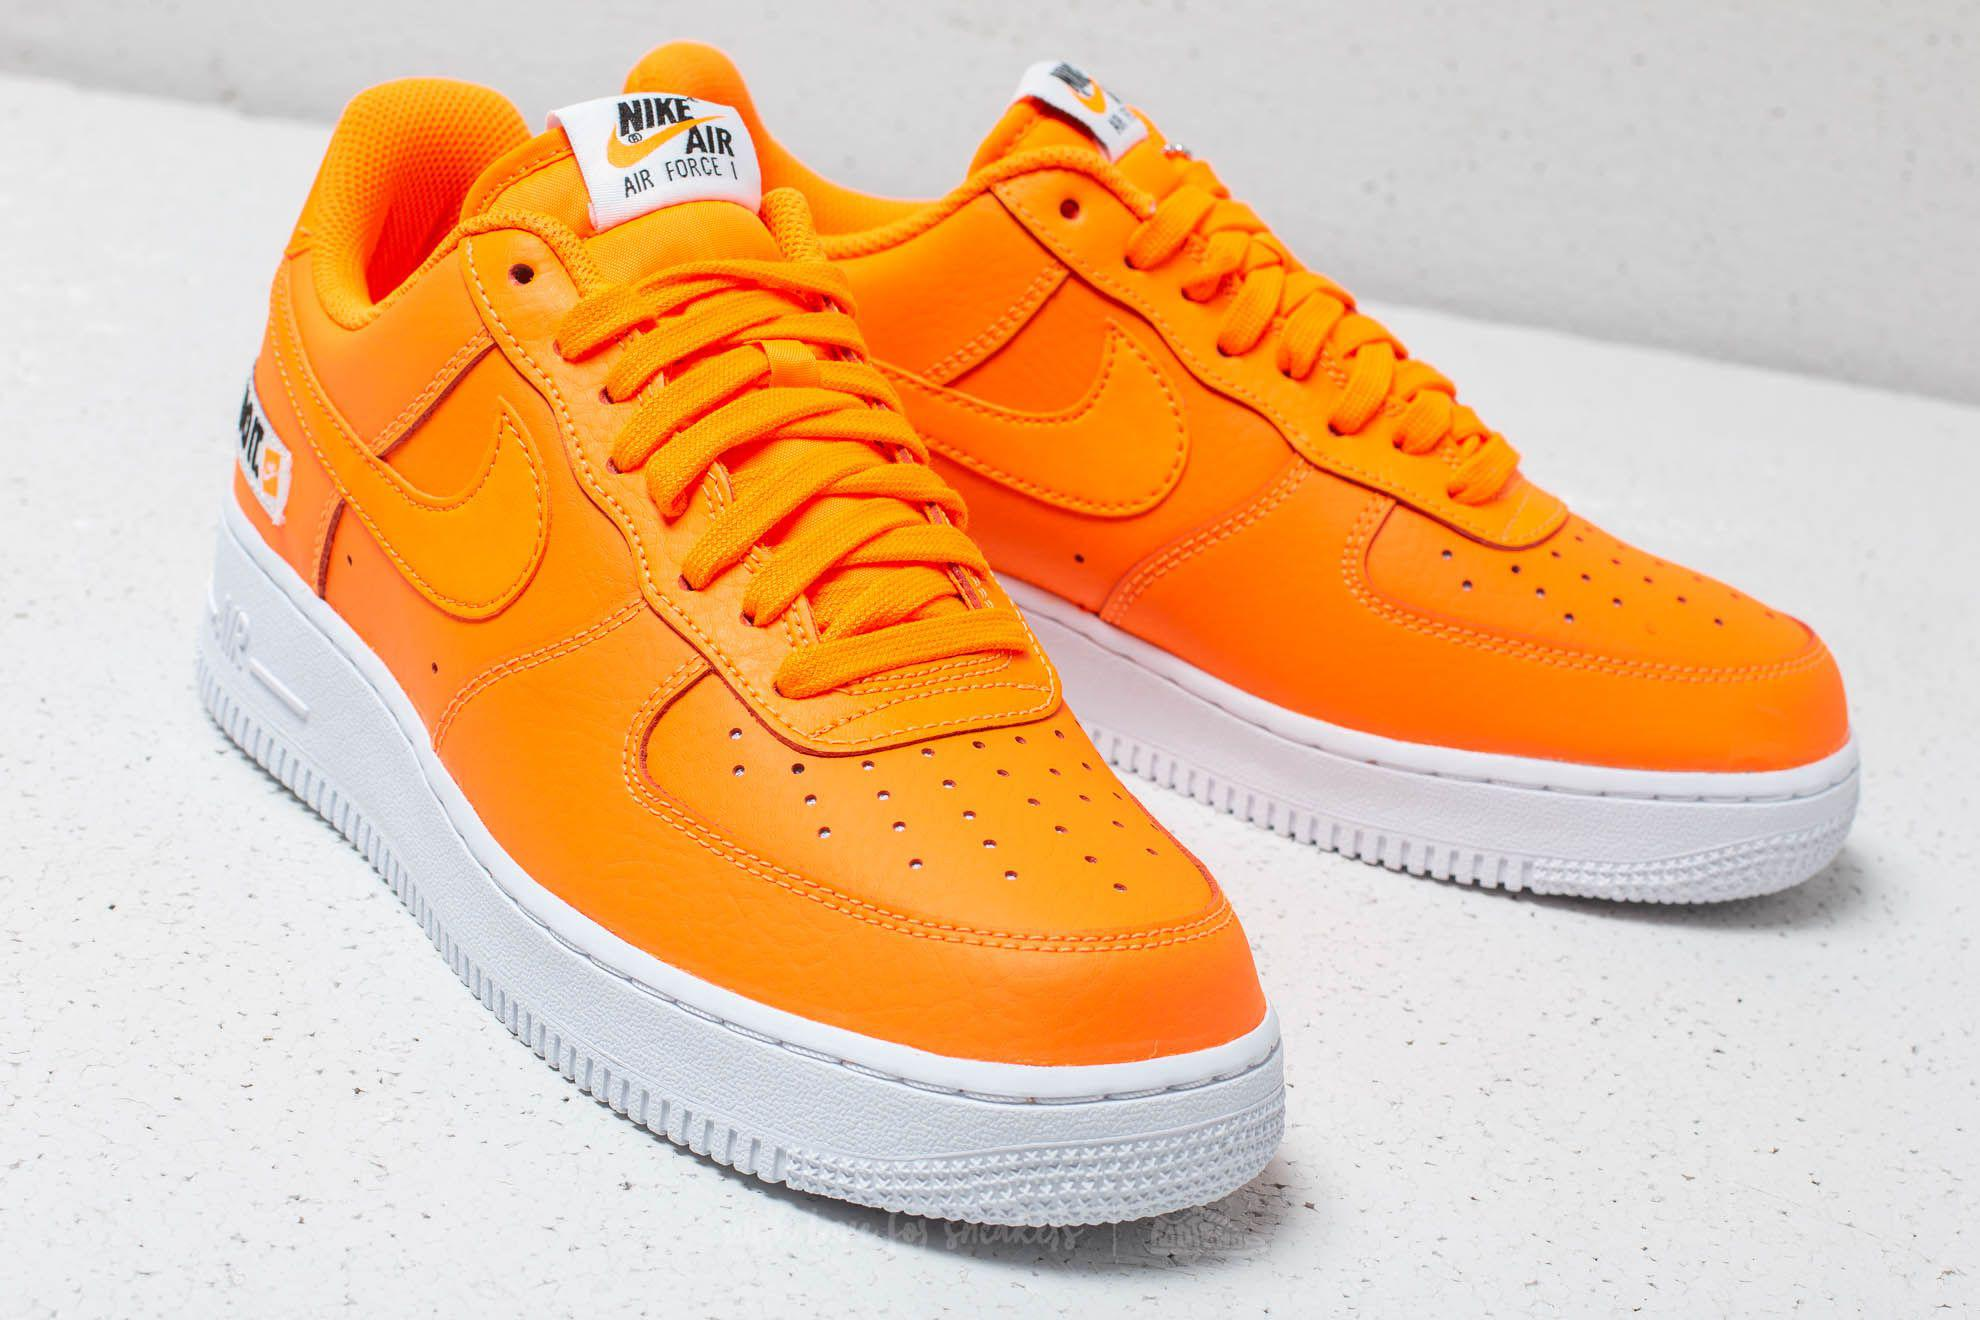 859e53d0f4 Nike Air Force 1 ́07 Lv8 Jdi Leather Total Orange/ Total Orange in ...